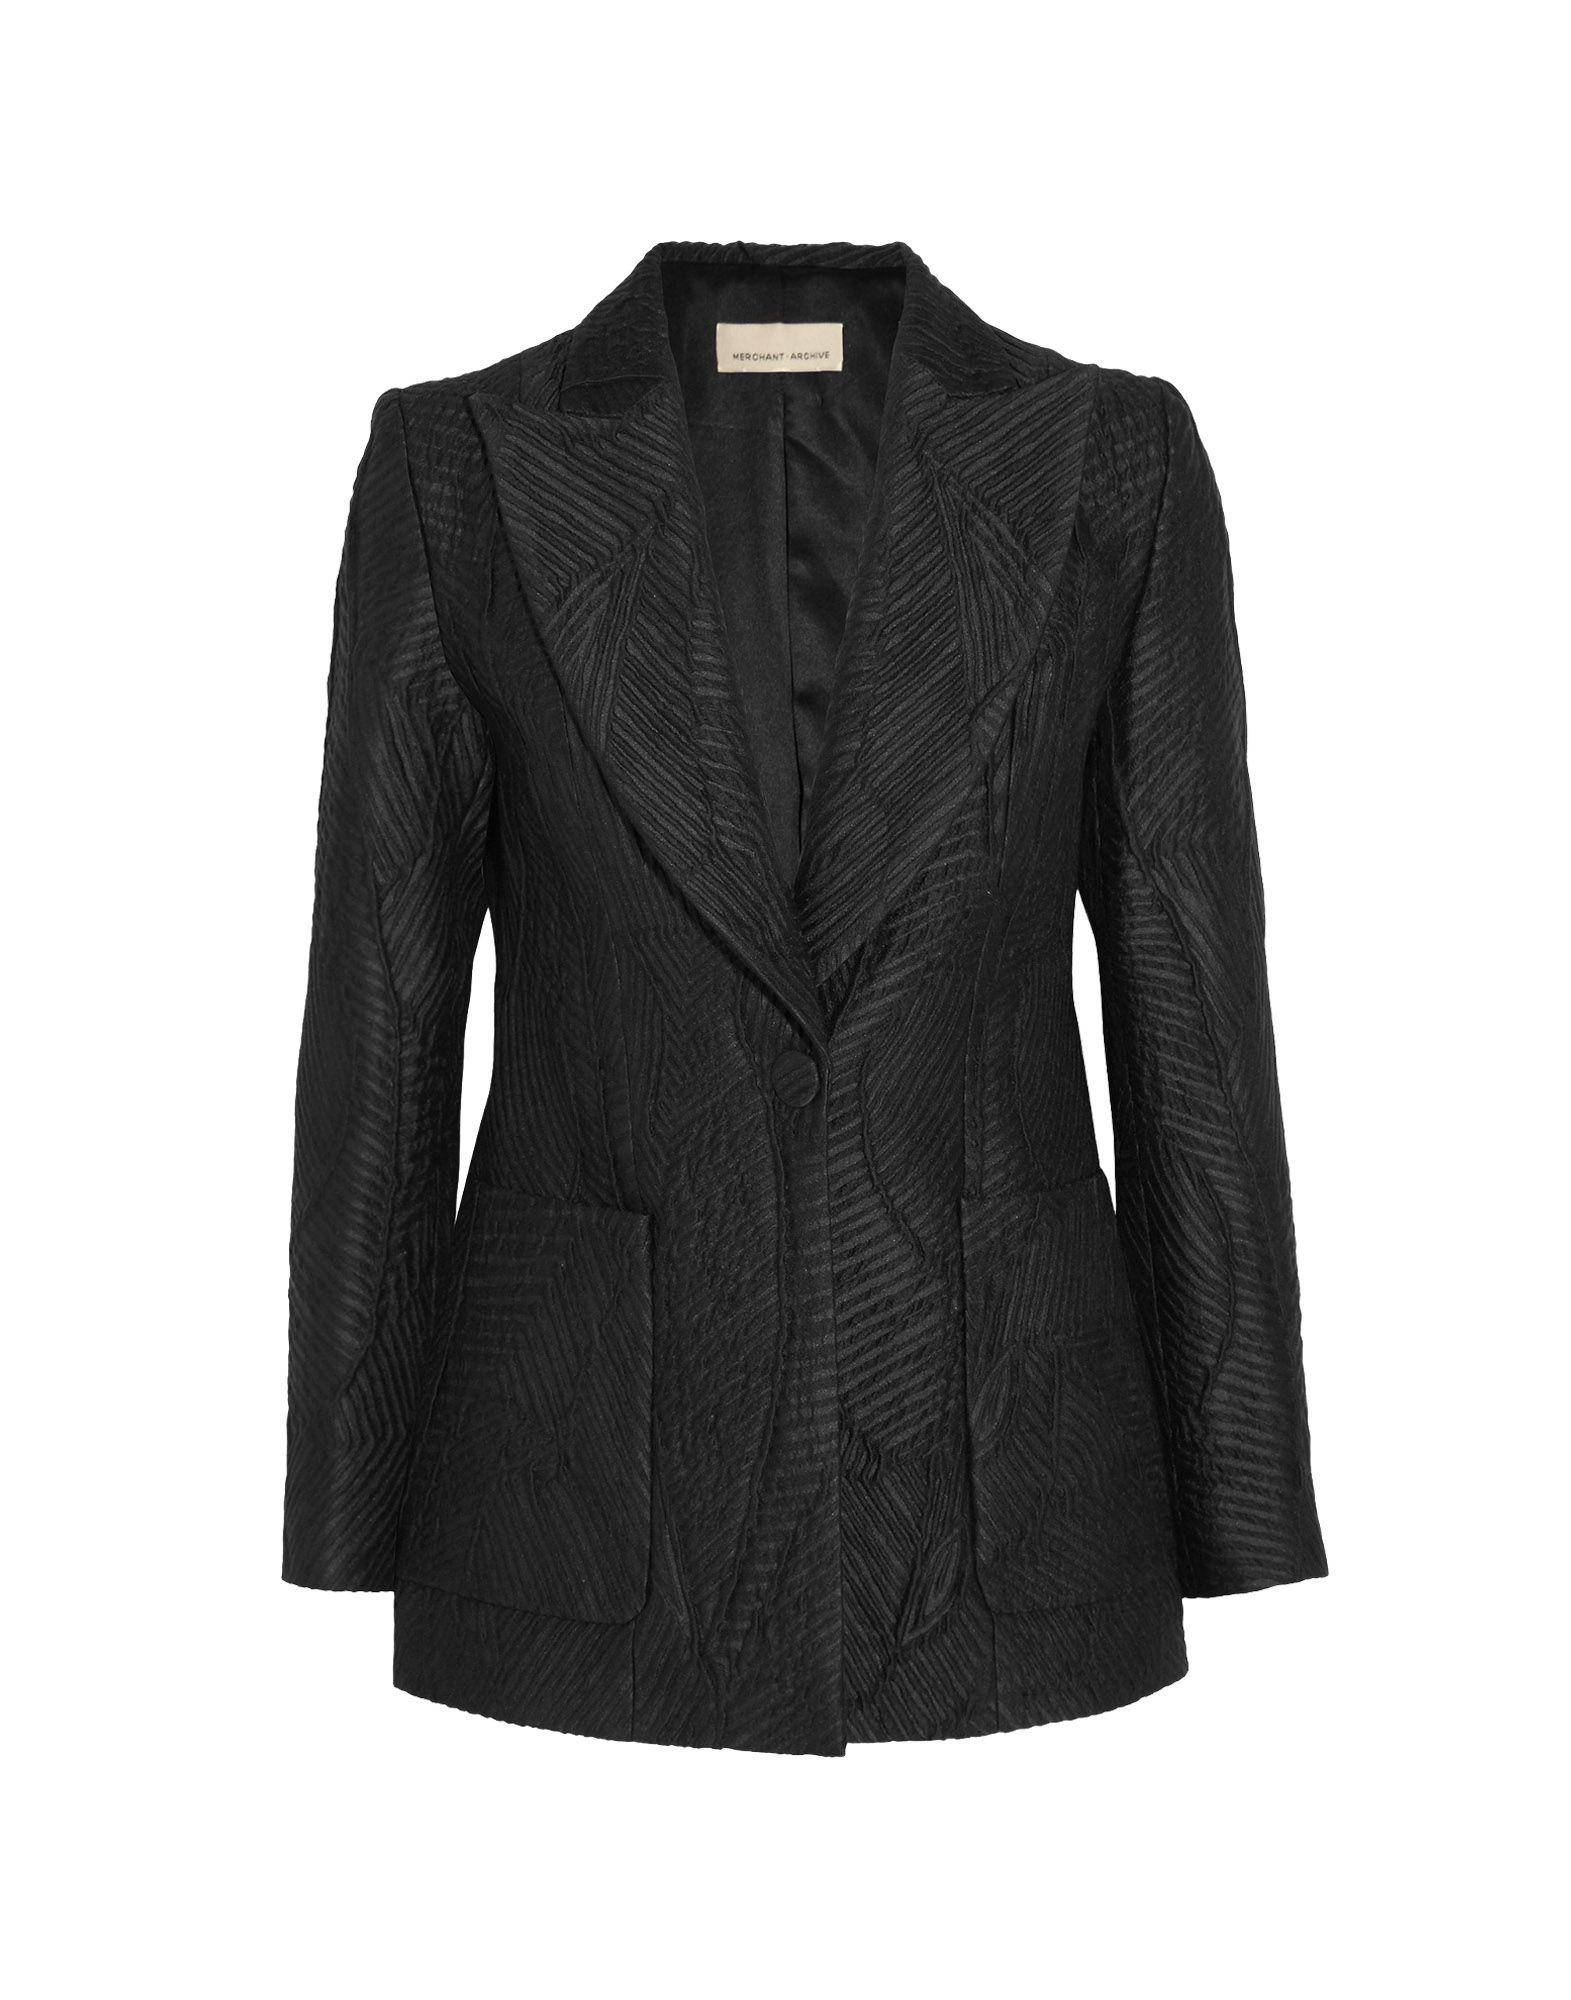 MERCHANT ARCHIVE Blazers in Black